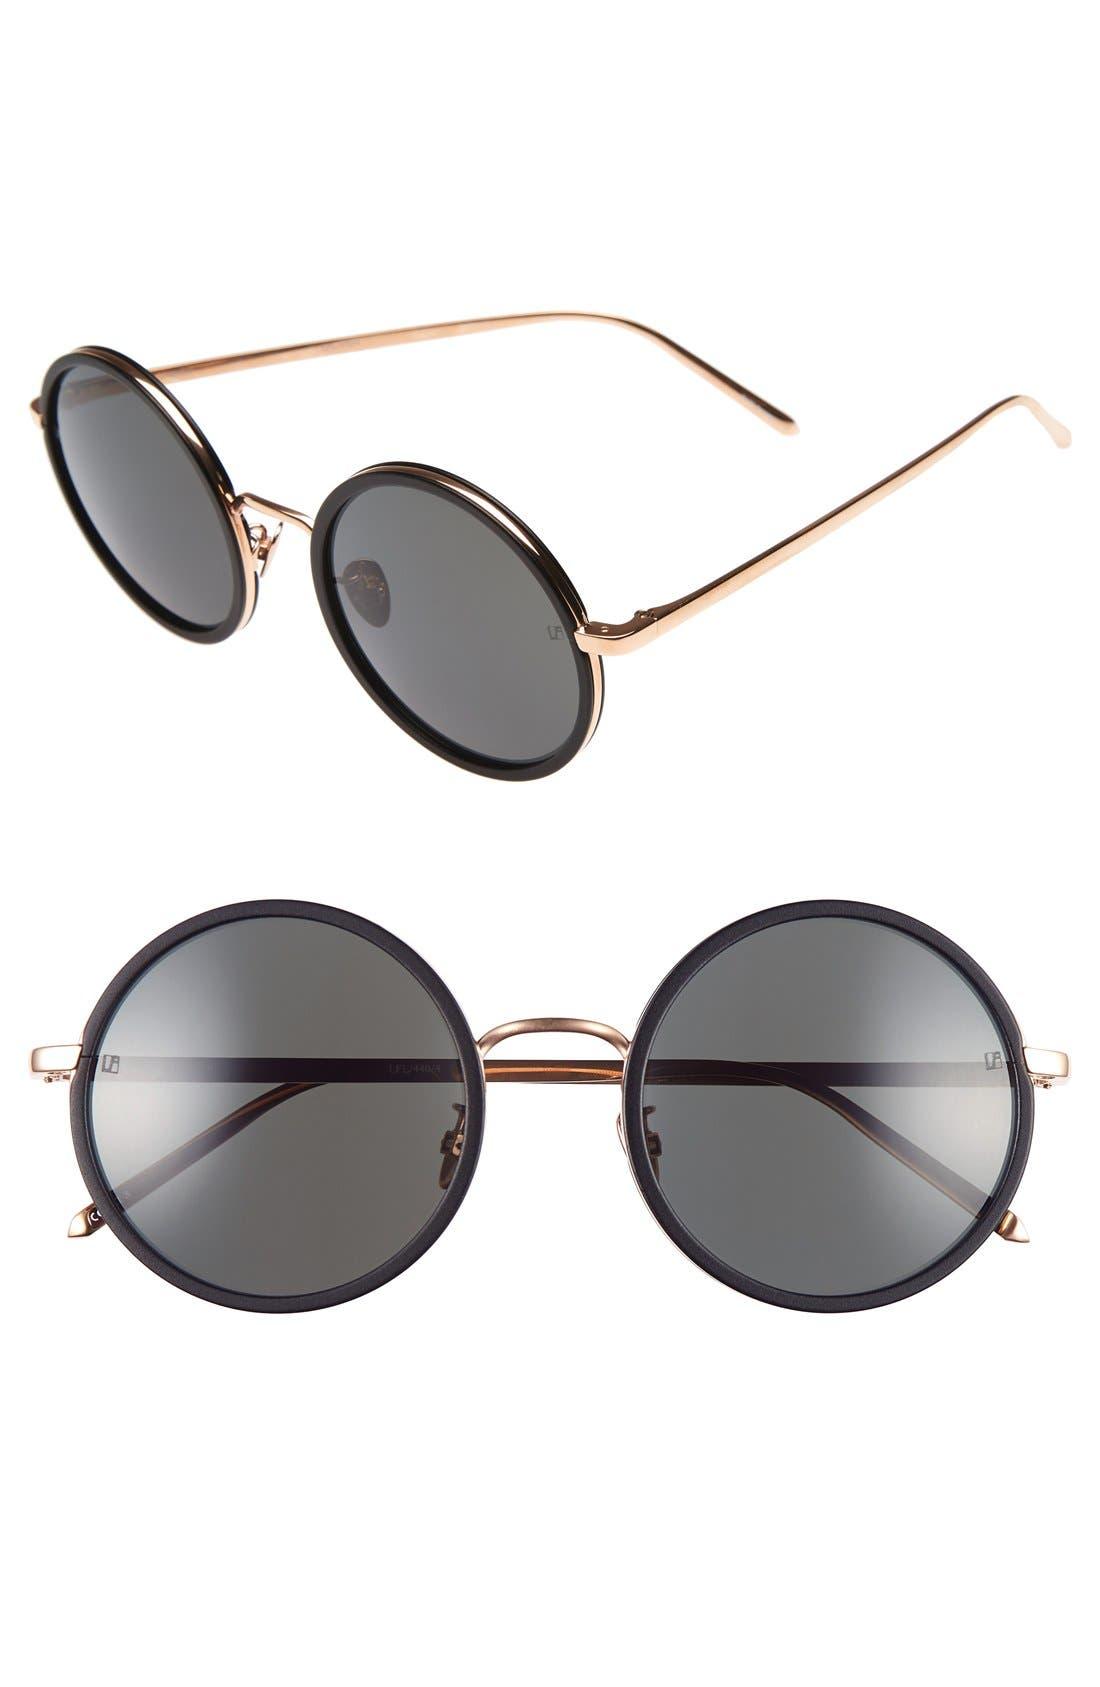 Linda Farrow 52mm Round 18 Karat Rose Gold Trim Sunglasses